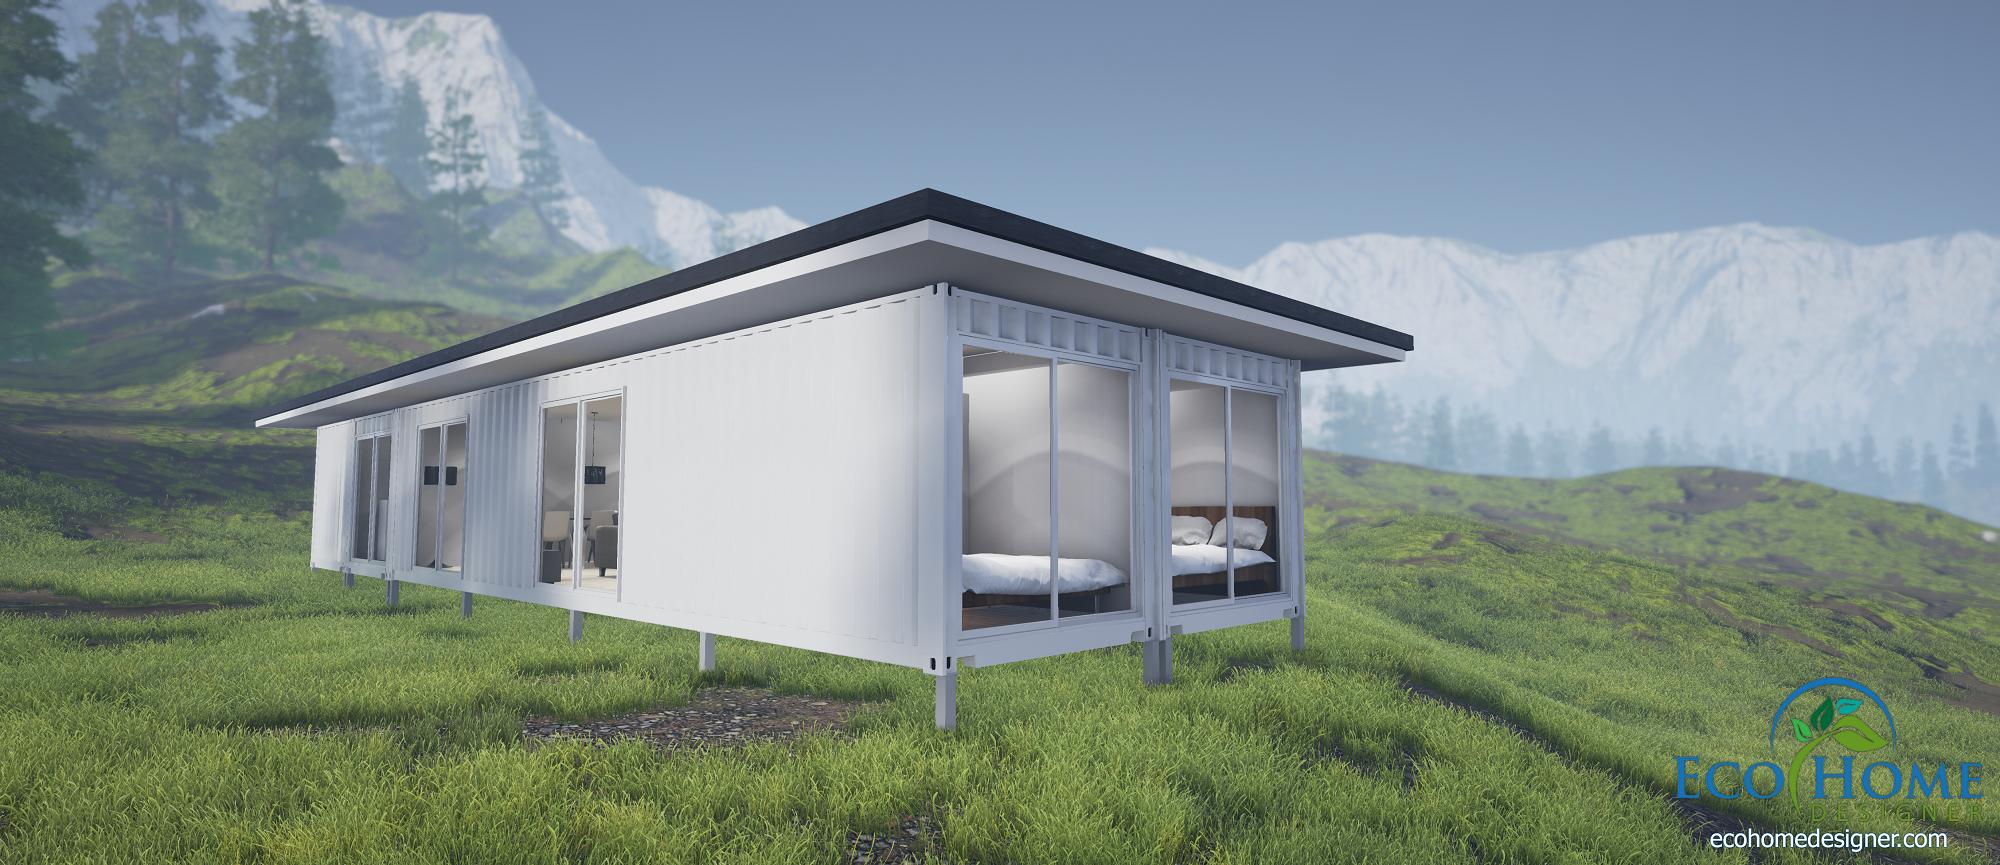 sch4-4-x-40ft-three-bedroom-container-home- ... & SCH4 4 x 40ft Three Bedroom Container Home   Eco Home Designer